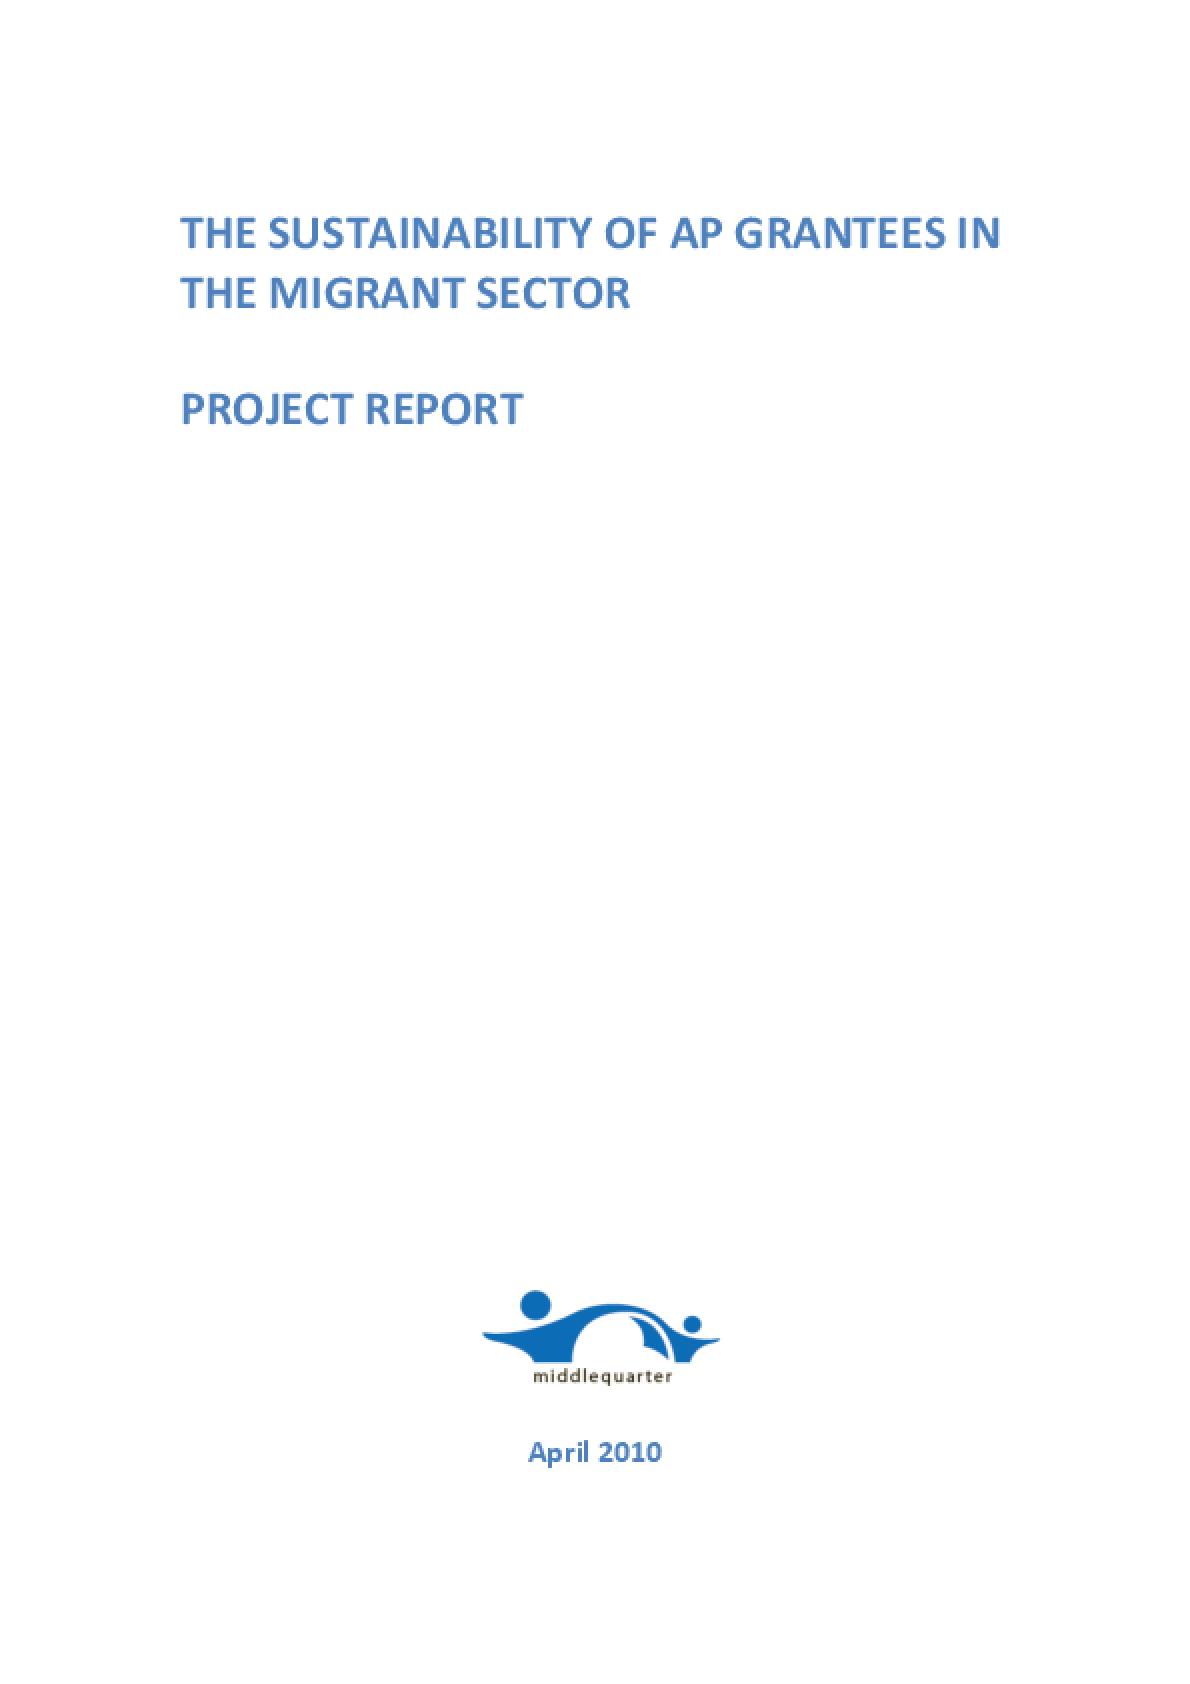 The Sustainability of Atlantic Philanthropies Grantees in the Migrant Sector